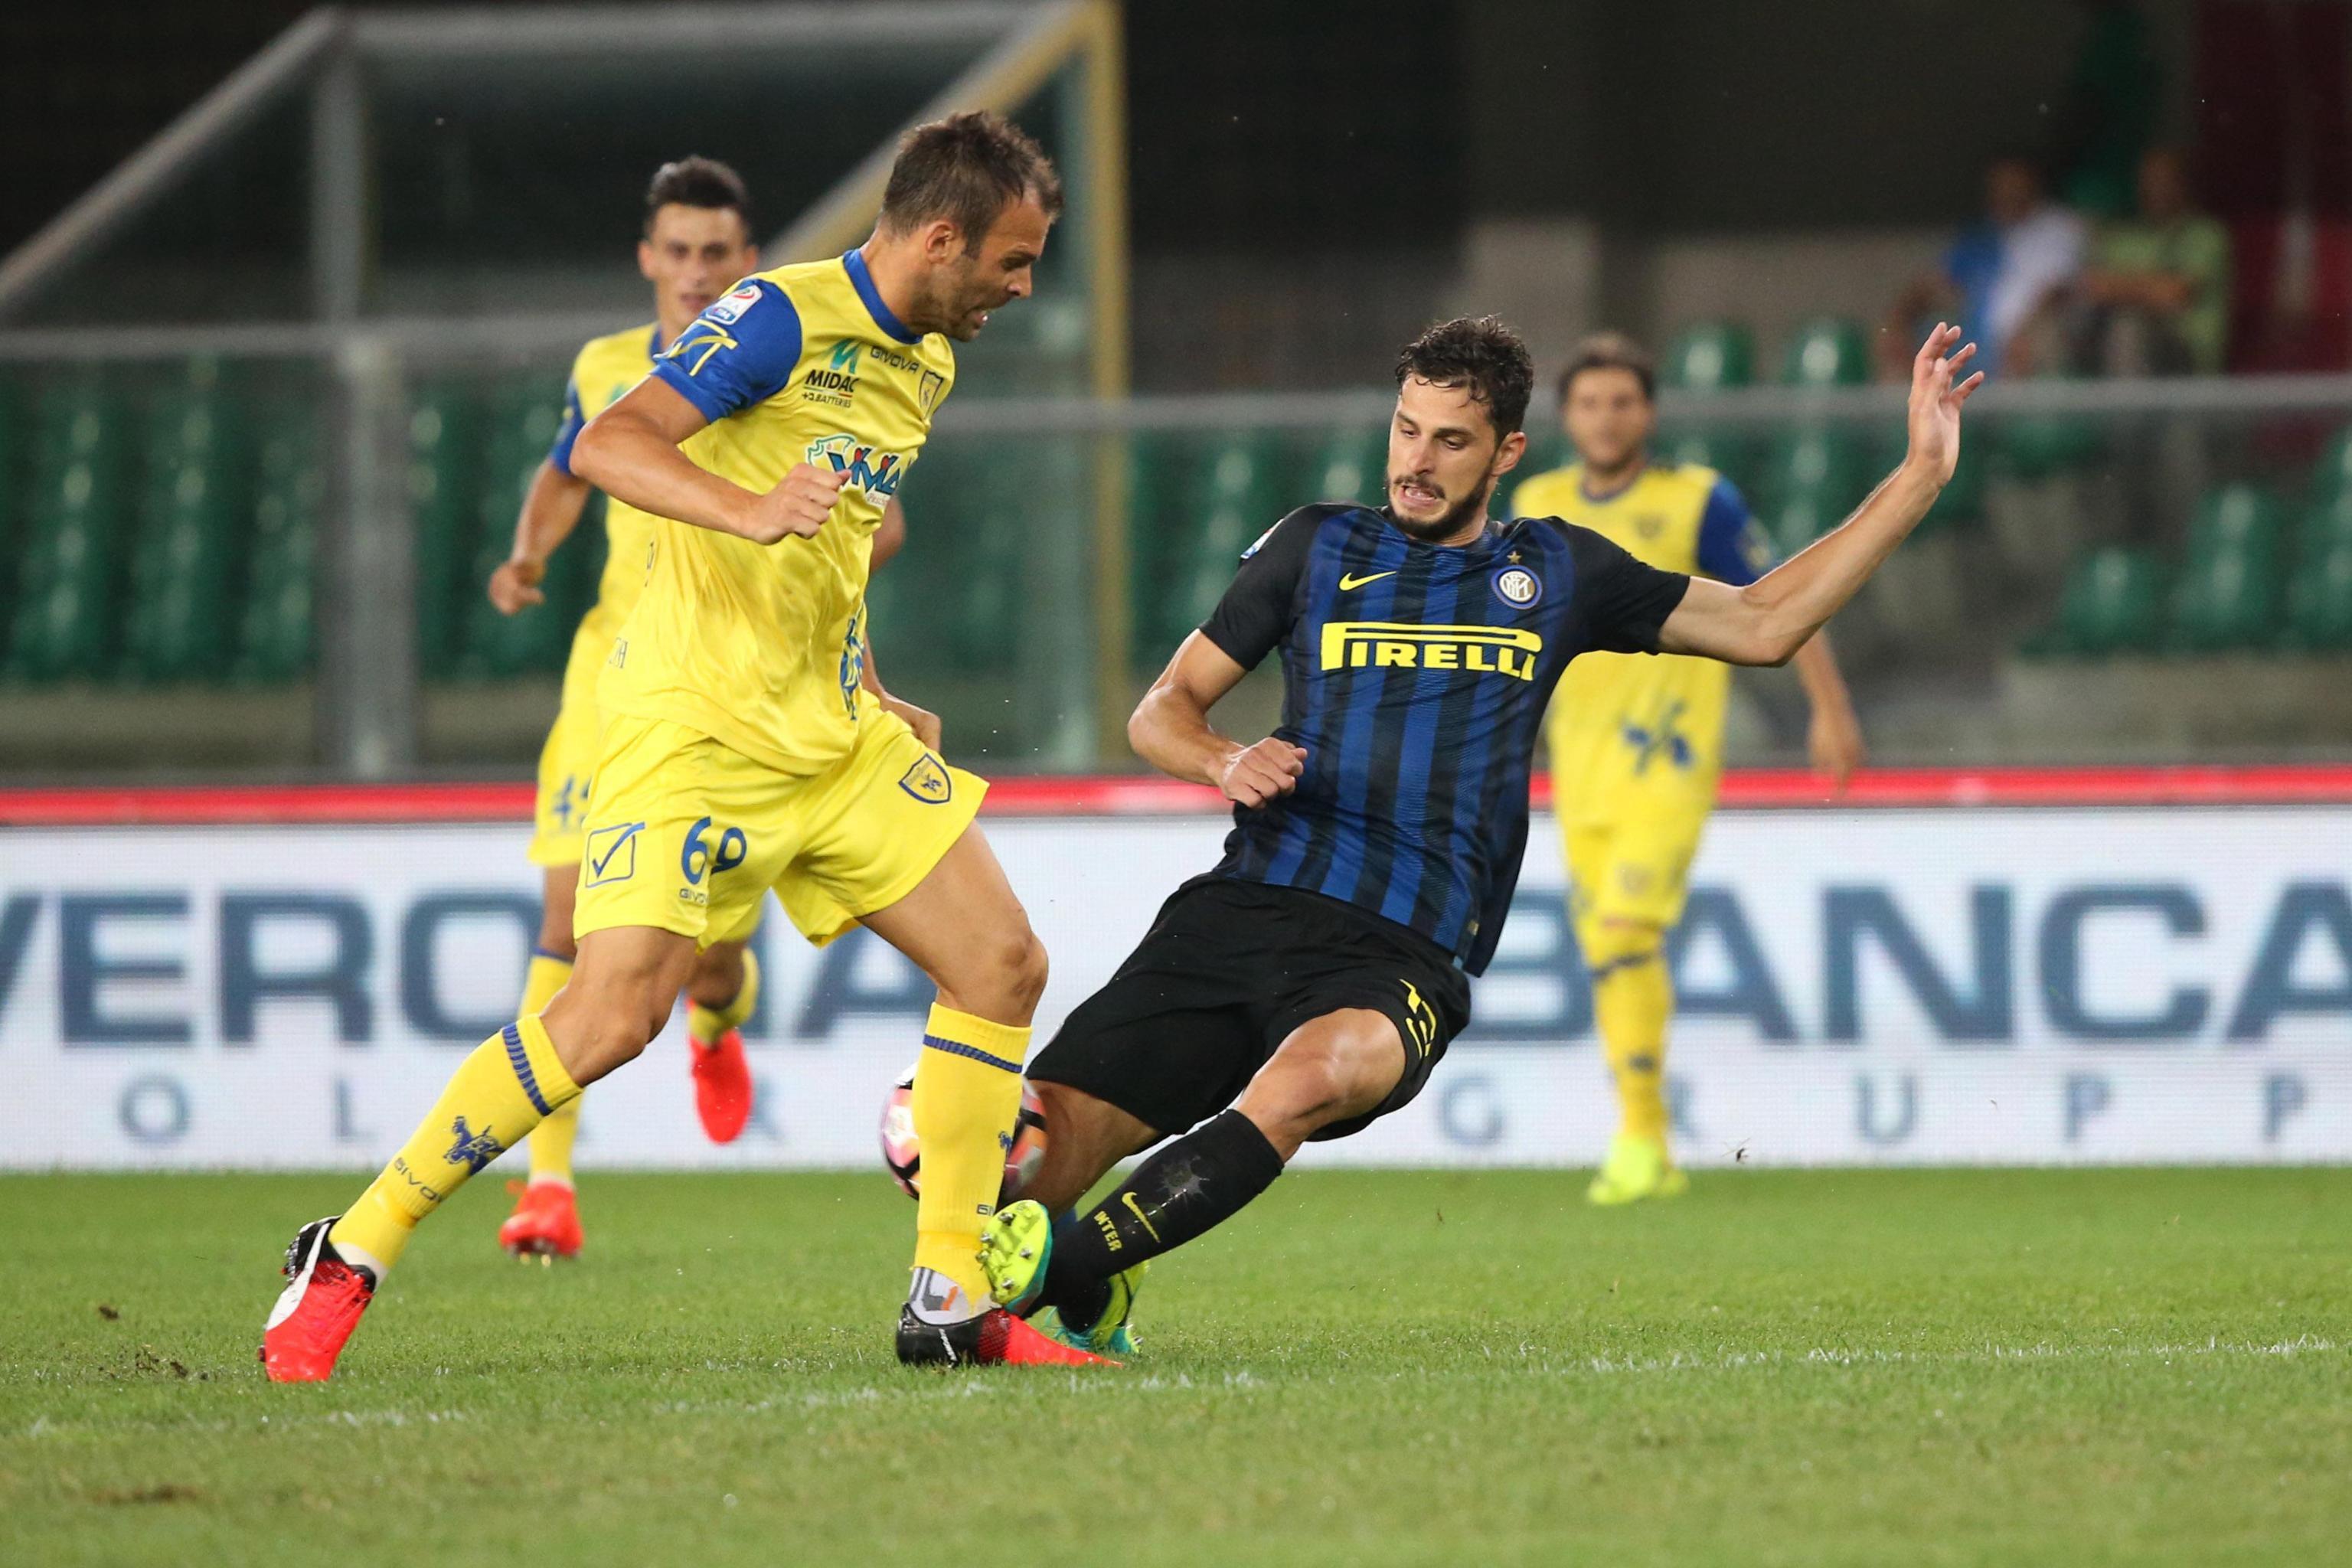 Soi kèo Empoli vs Chievo